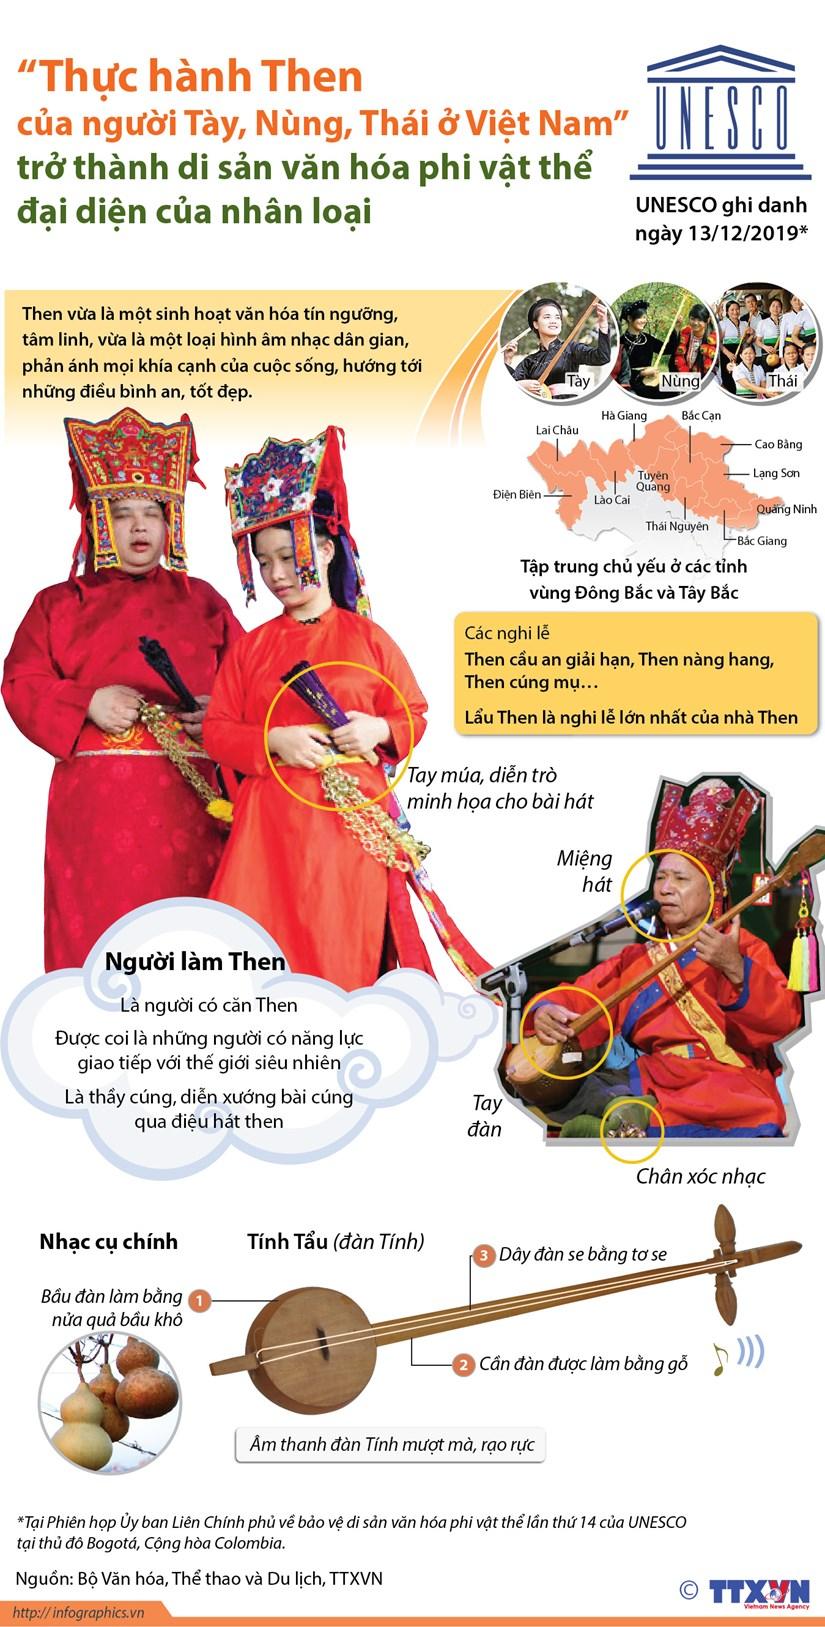 [Infographics] Thuc hanh Then tro thanh di san van hoa phi vat the TG hinh anh 1